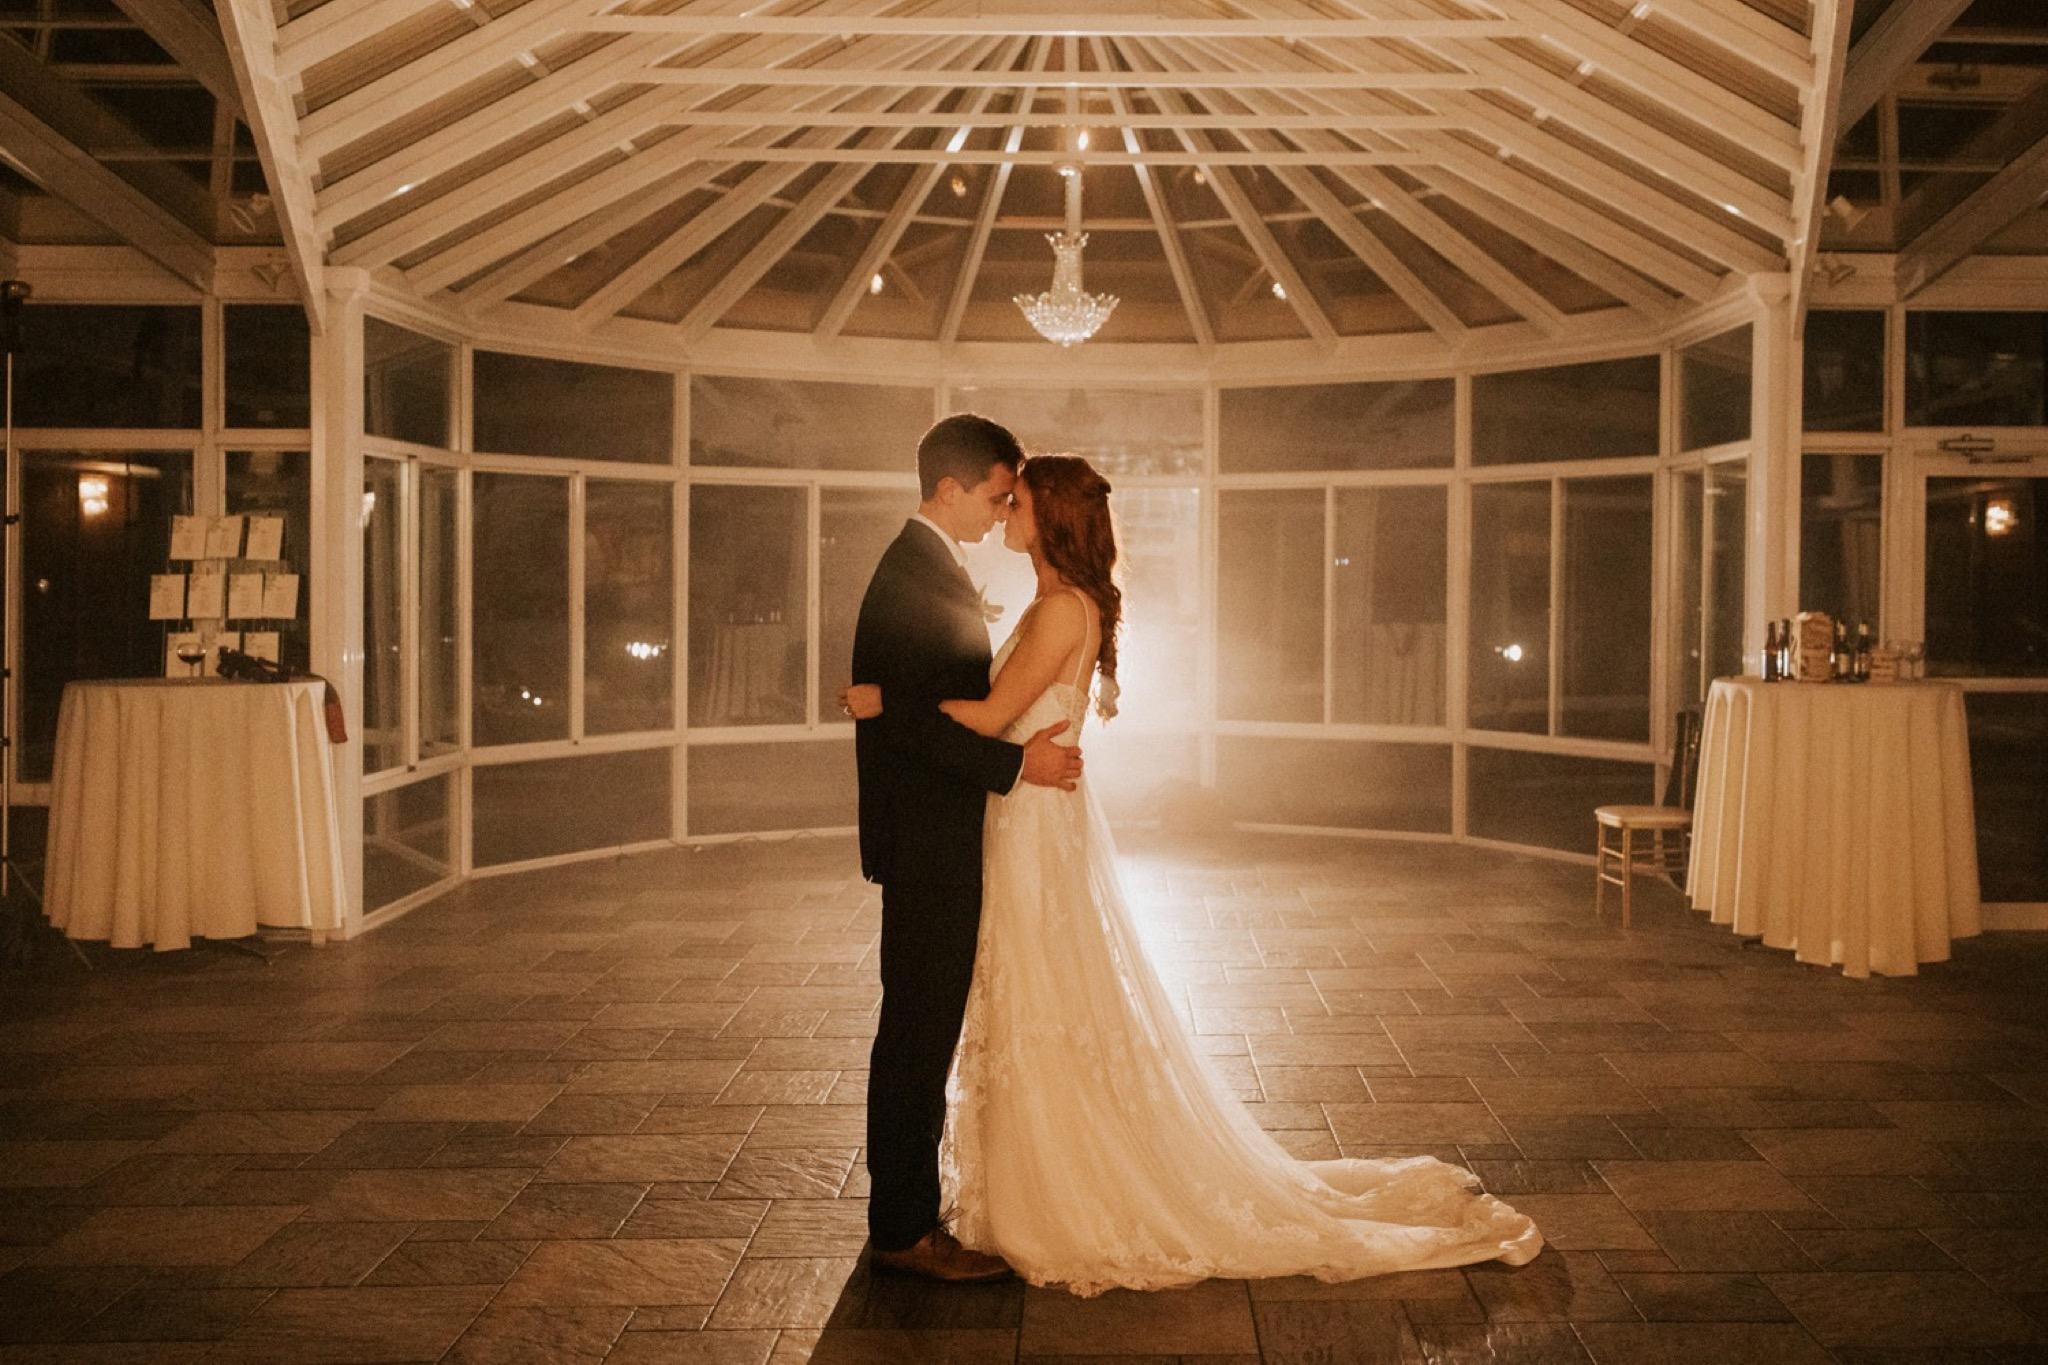 91_West Manor Estate Weddings - Pat Cori Photography-216_romantic_brideandgroom_WestManorEstate_Portraits_VirginiaWeddingPhotographer.jpg